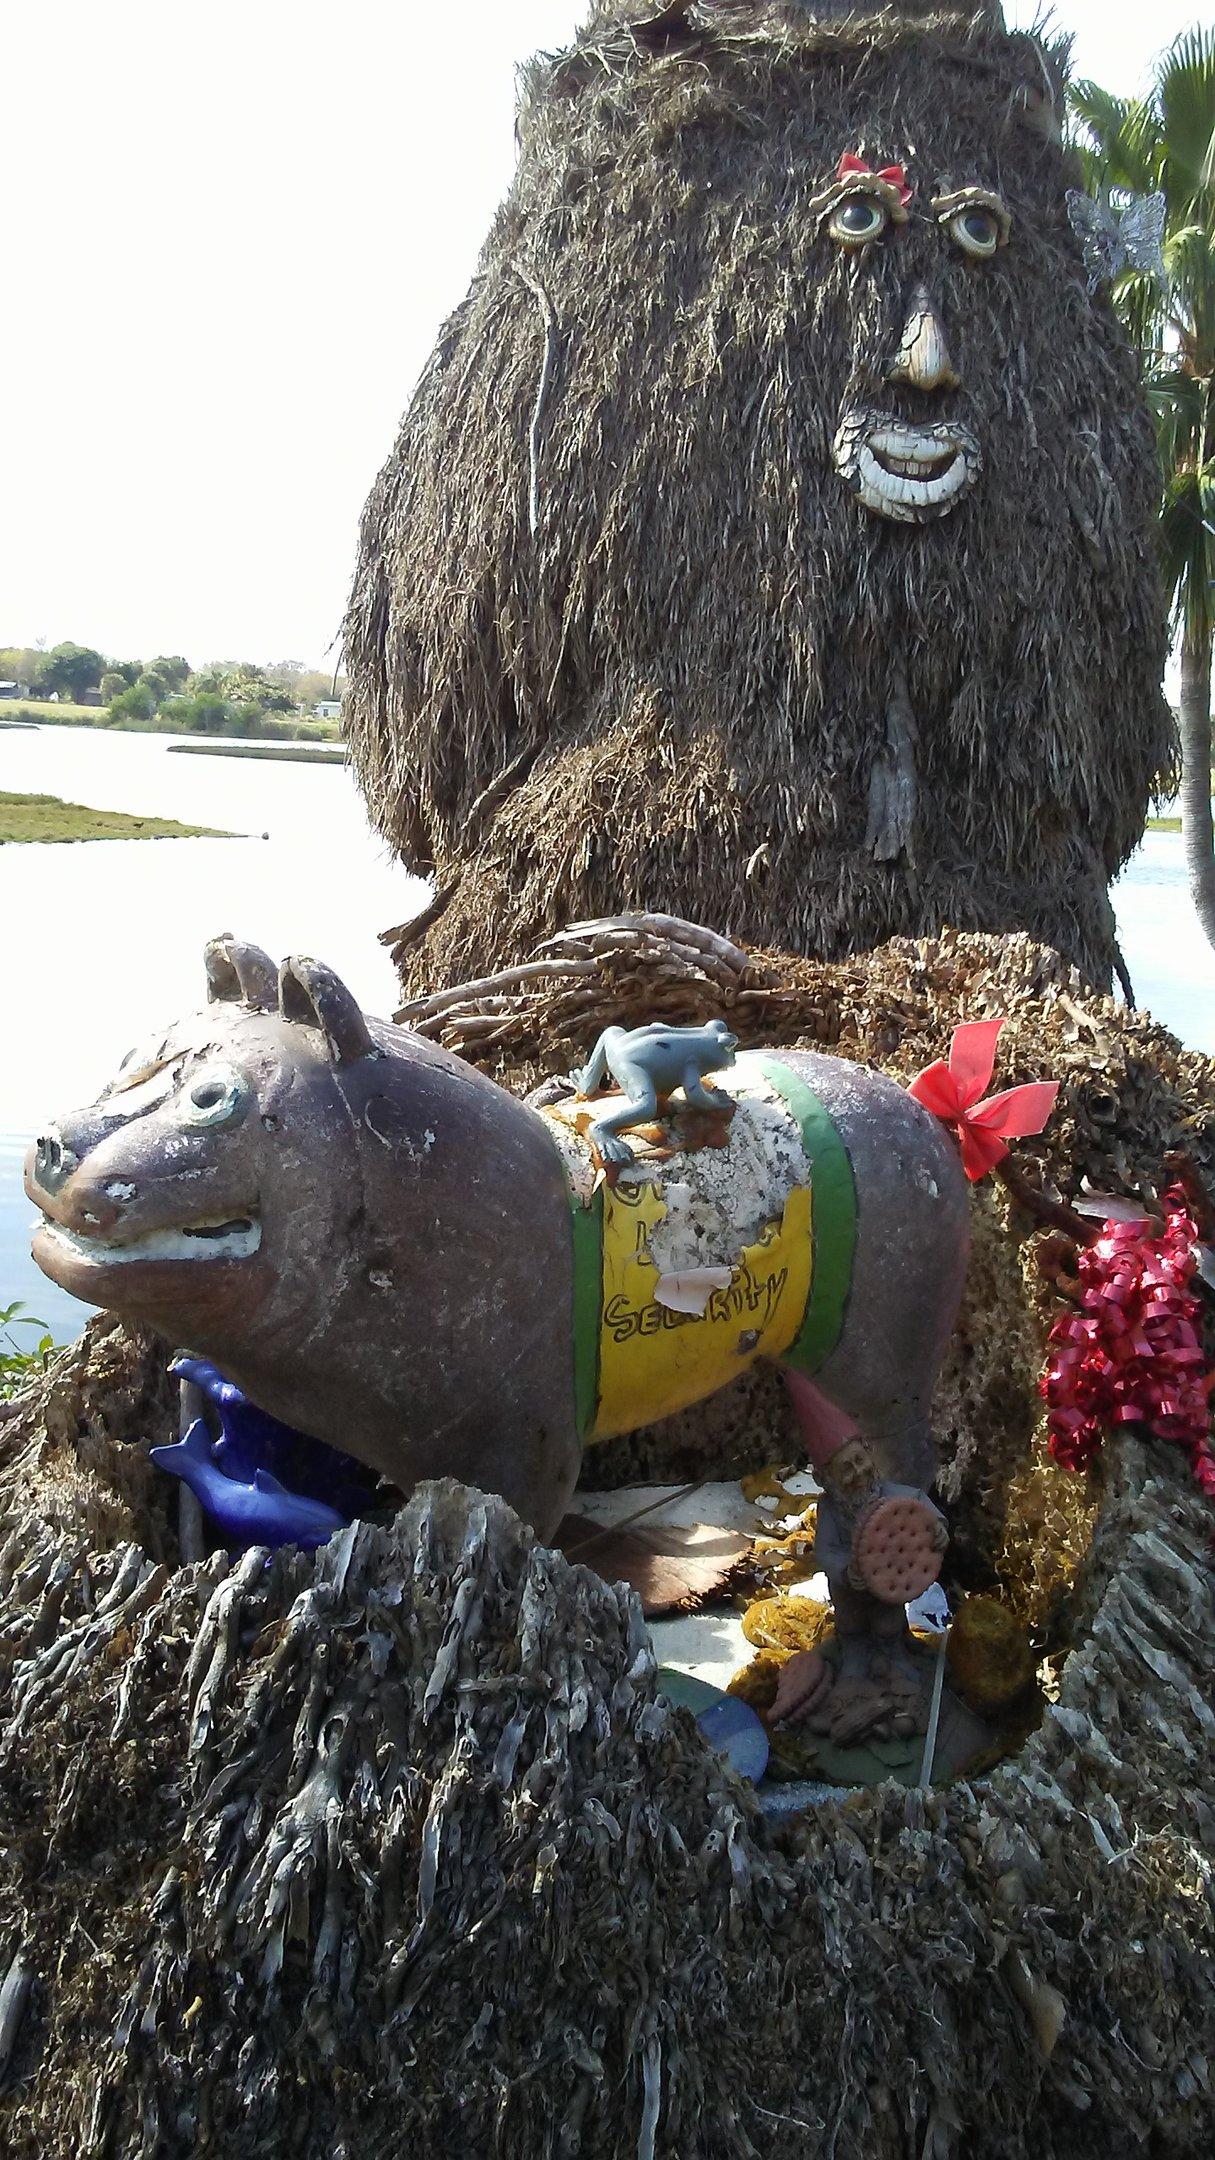 20190202_133237-jpg.48854_Gnome Village......!_Travel Stories_Squat the Planet_12:14 PM